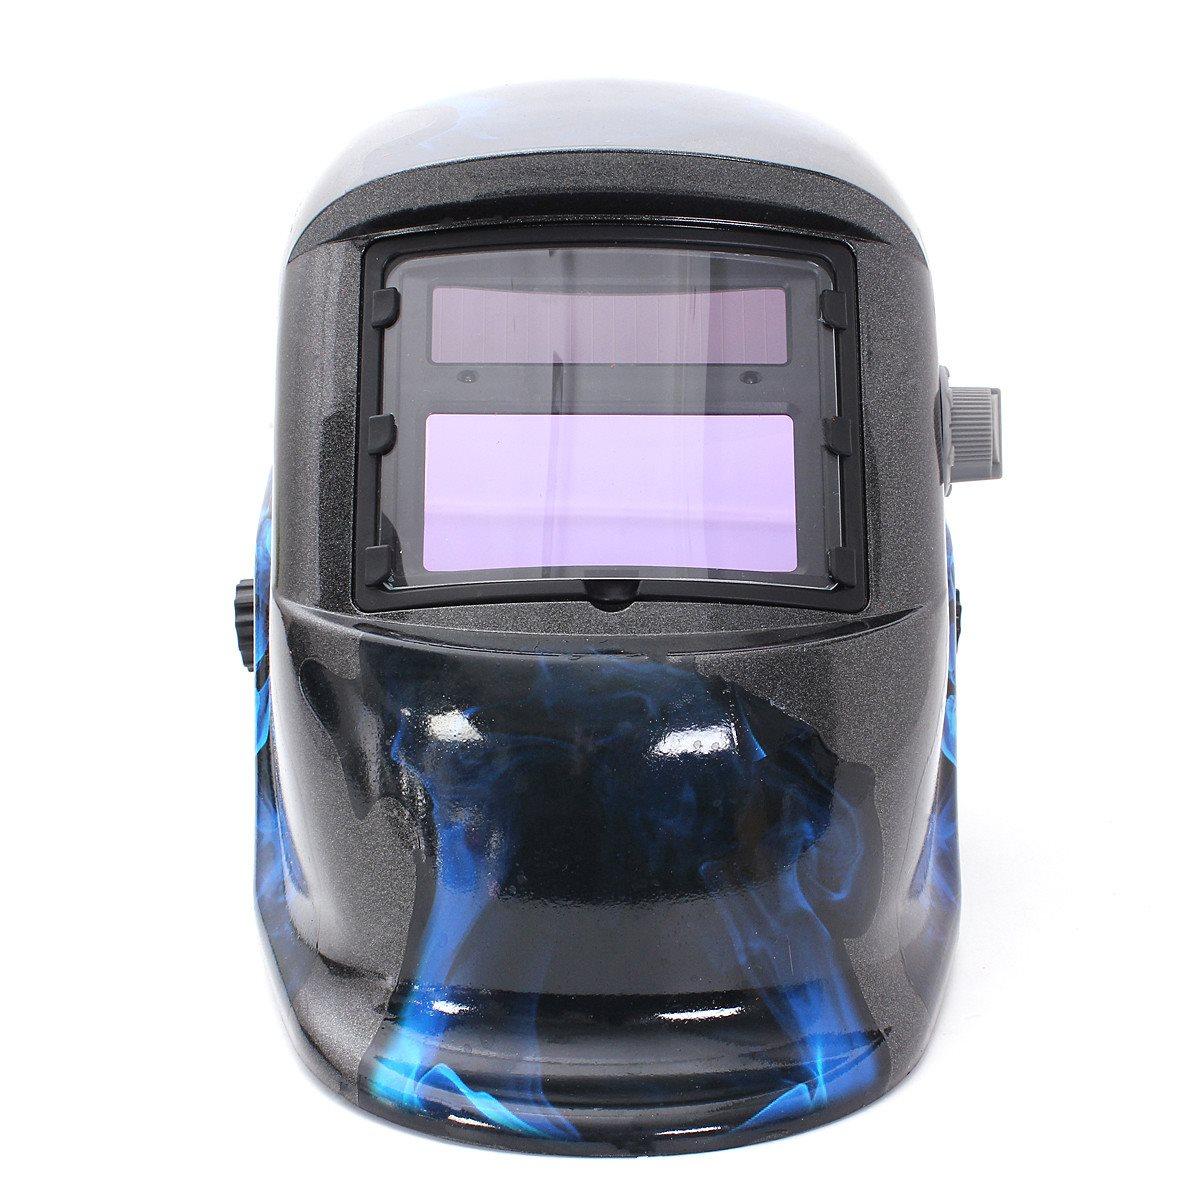 Hot Sale Pro Solar Welding Mask Auto Darkening Welding Helmet Blue Skull Style ARC TIG MIG Welding Helmet смартфон highscreen fest xl pro blue